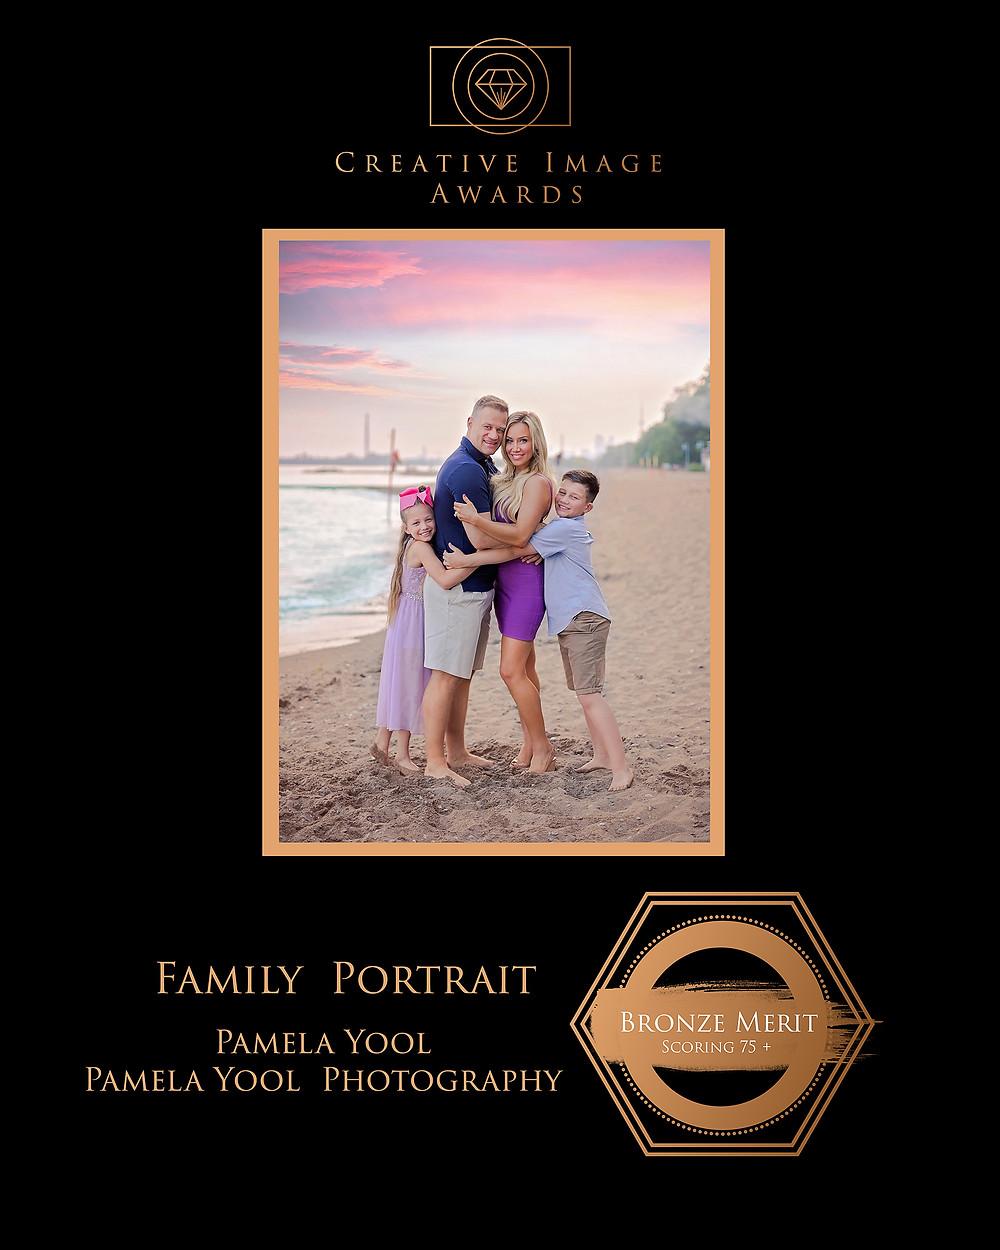 Family Portrait Award Winning Image - Pamela Yool Photography